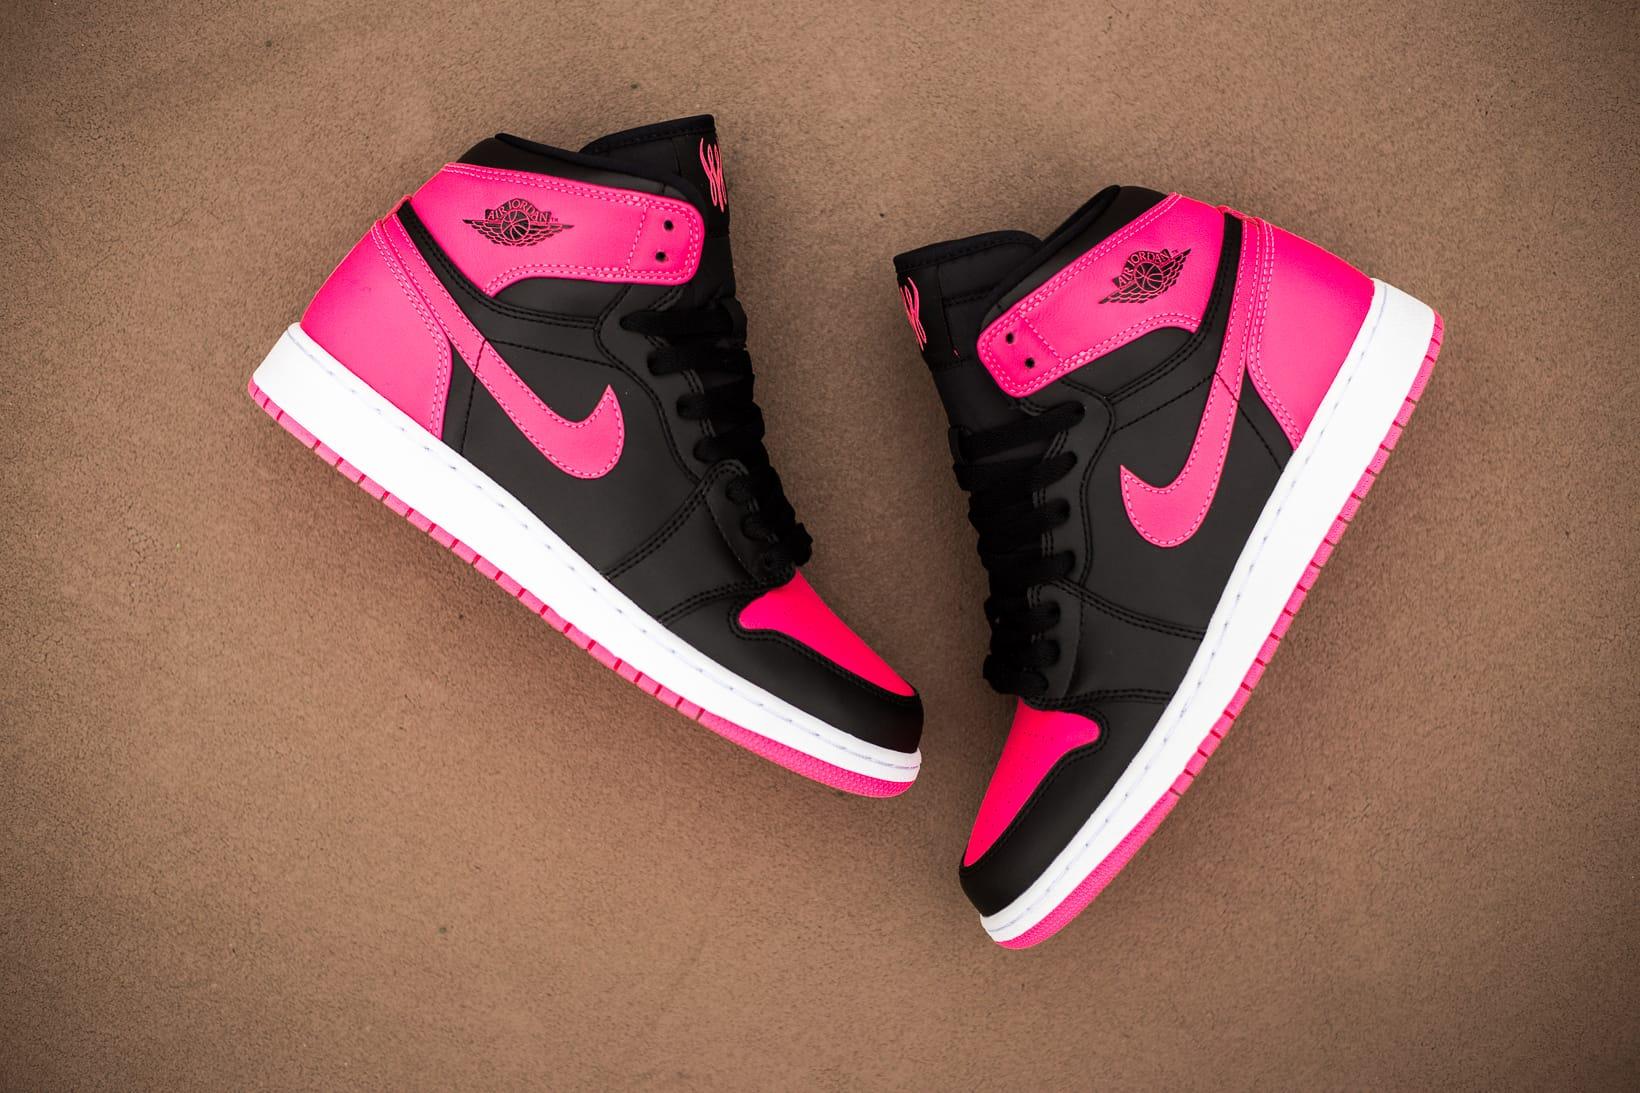 Nike and Jordan Brand Collaboration